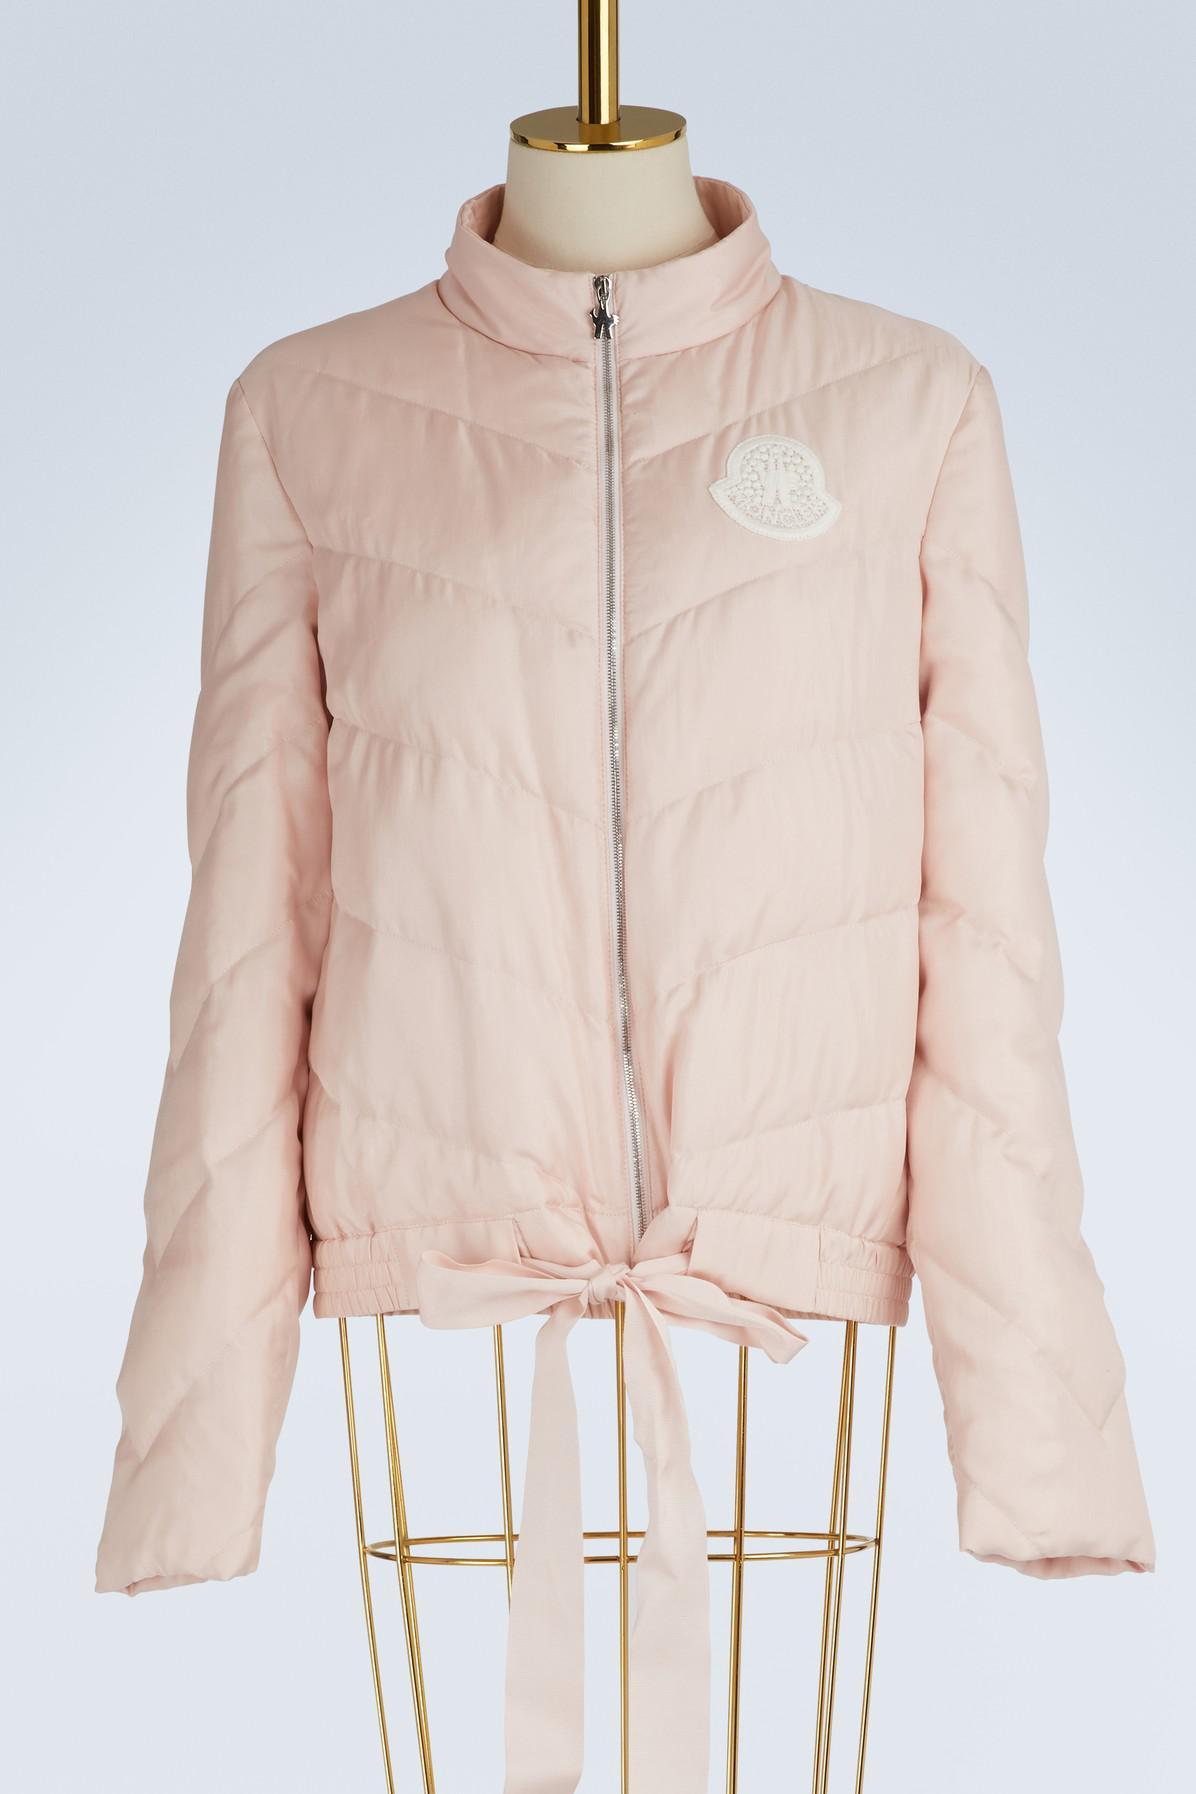 f58259b7c292 switzerland moncler vest pink website victoria 6ad0a 90d25